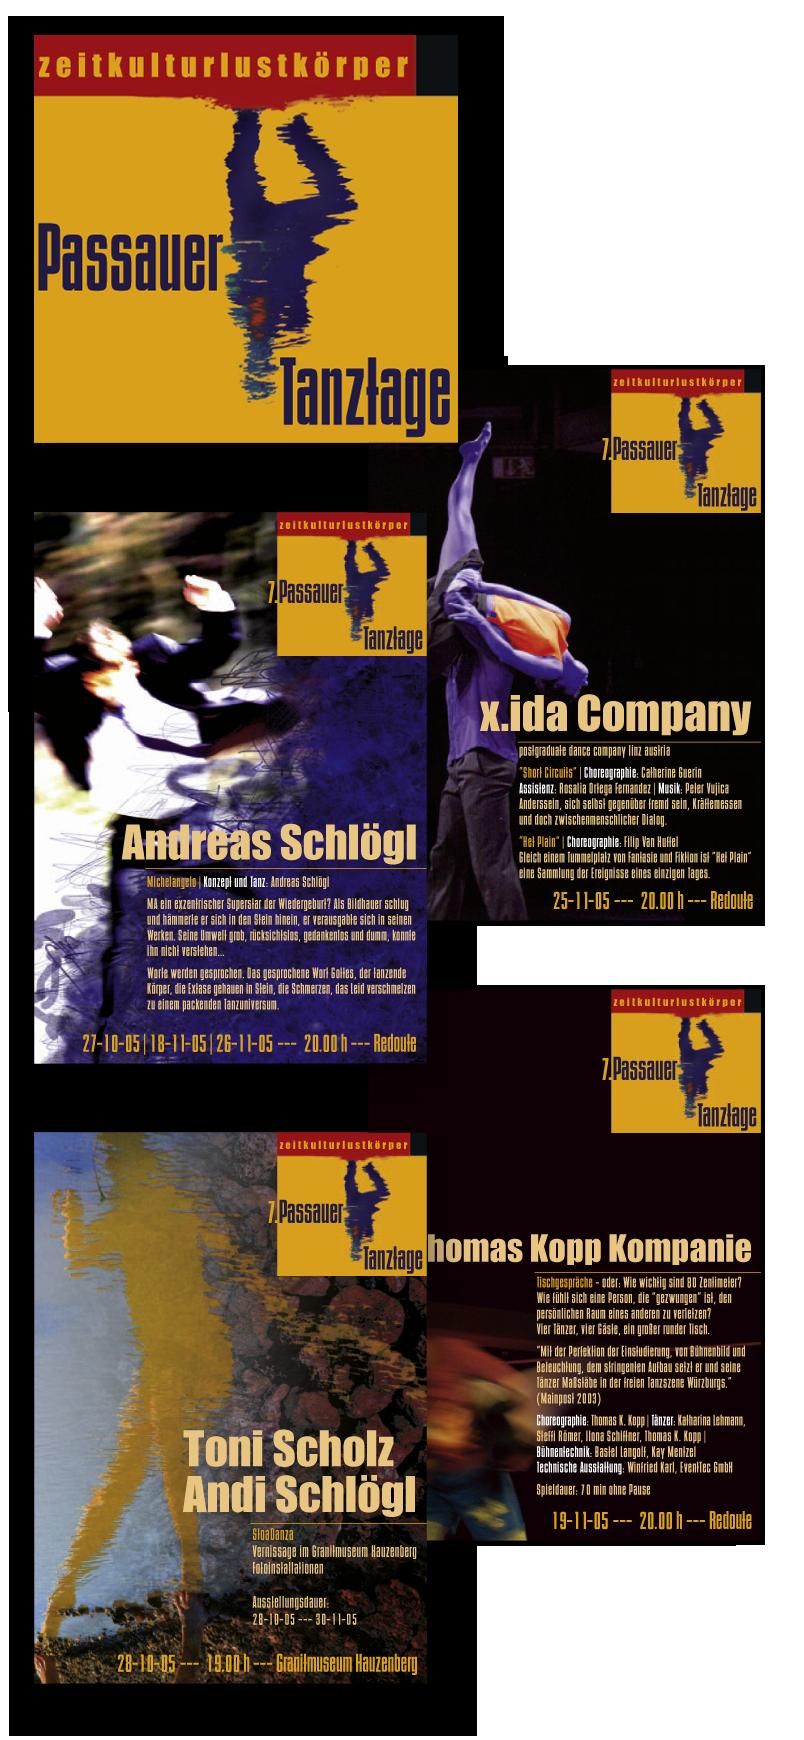 Passauer Tanztage / communication